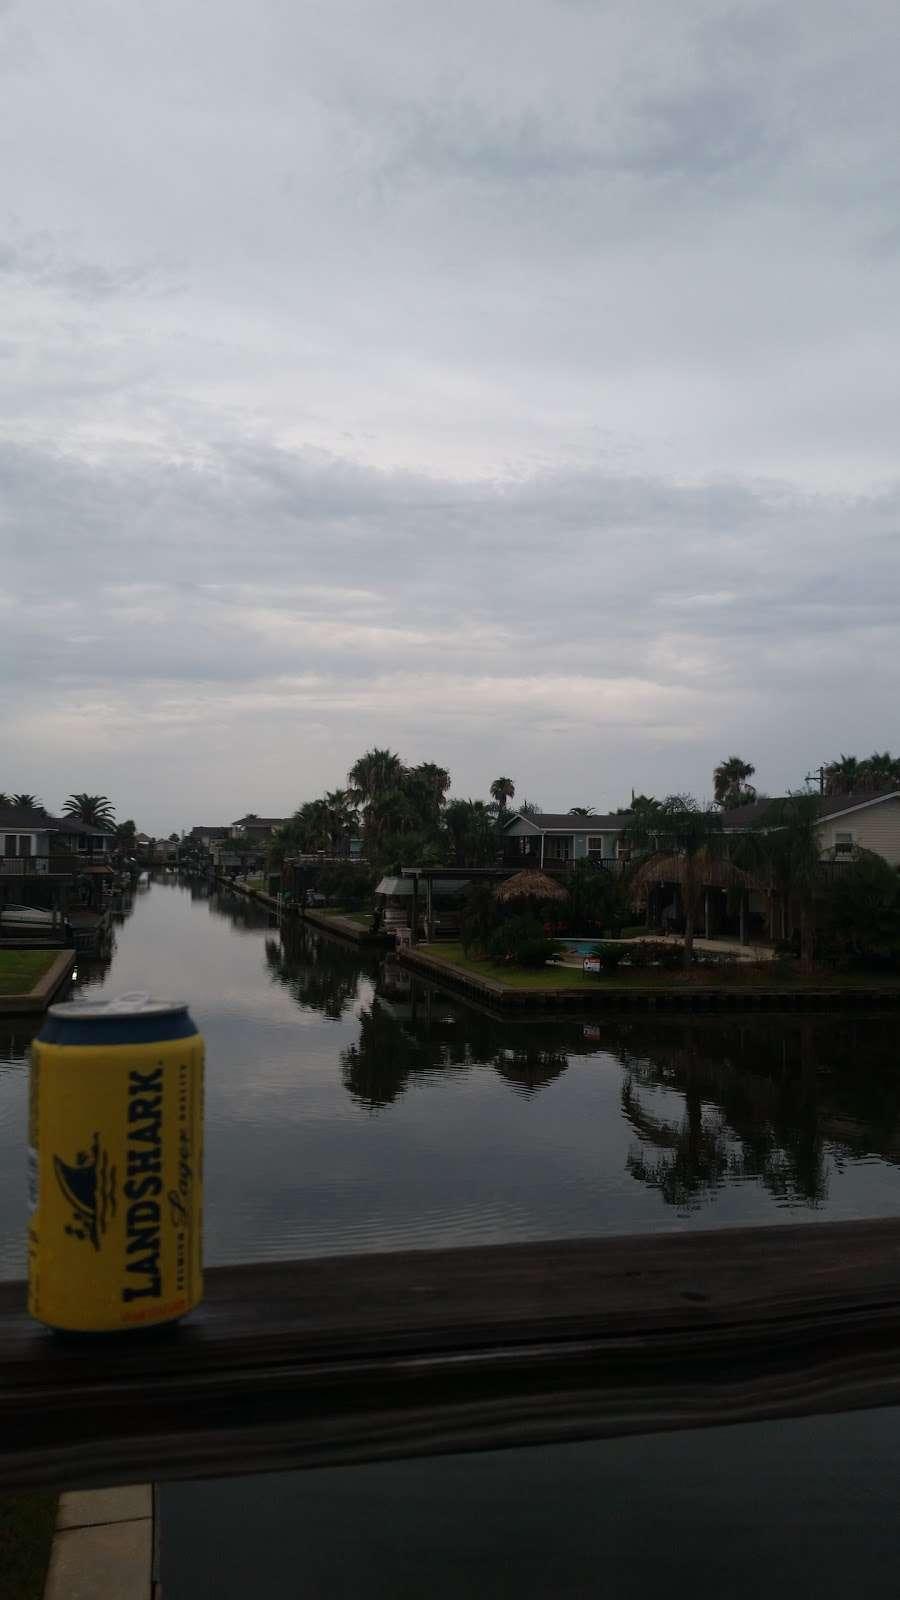 Bay Breeze Waterfront Vacation House - real estate agency    Photo 6 of 10   Address: 16703 Managua Way, Galveston, TX 77554, USA   Phone: (832) 818-4234